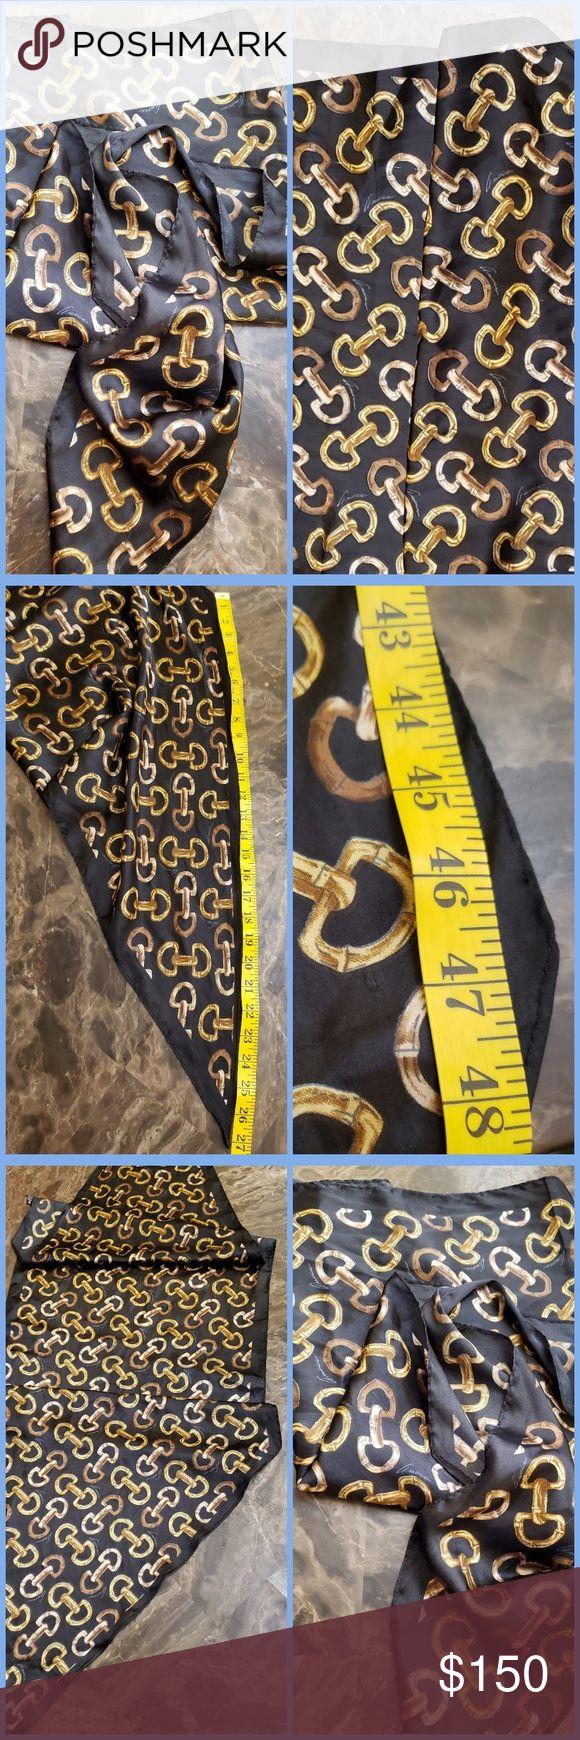 Rare Vintage Bamboo Horsebit Silk Gucci Scarf/Wrap Gorgeous Rare Vintage Black/G…   – My Posh Picks